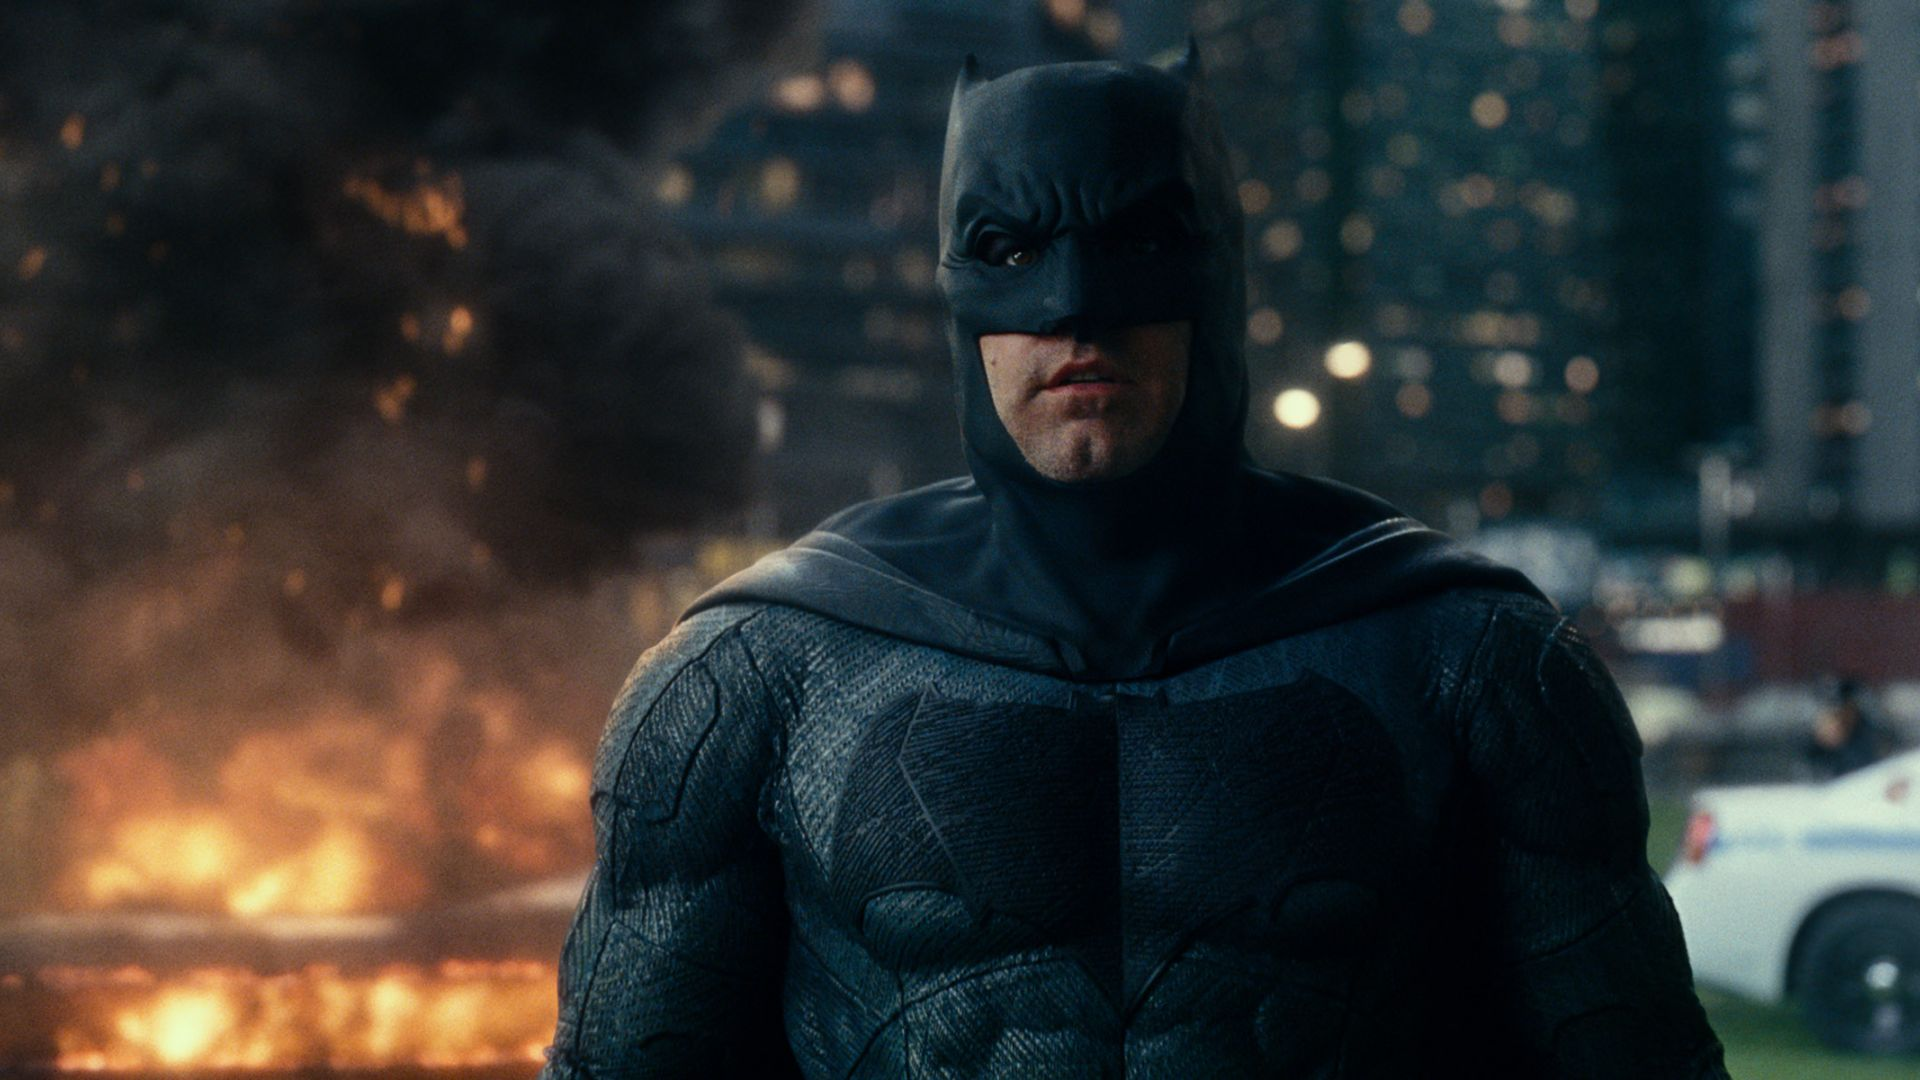 Wallpaper Batman, justice league, 2017 movie, screen from movie